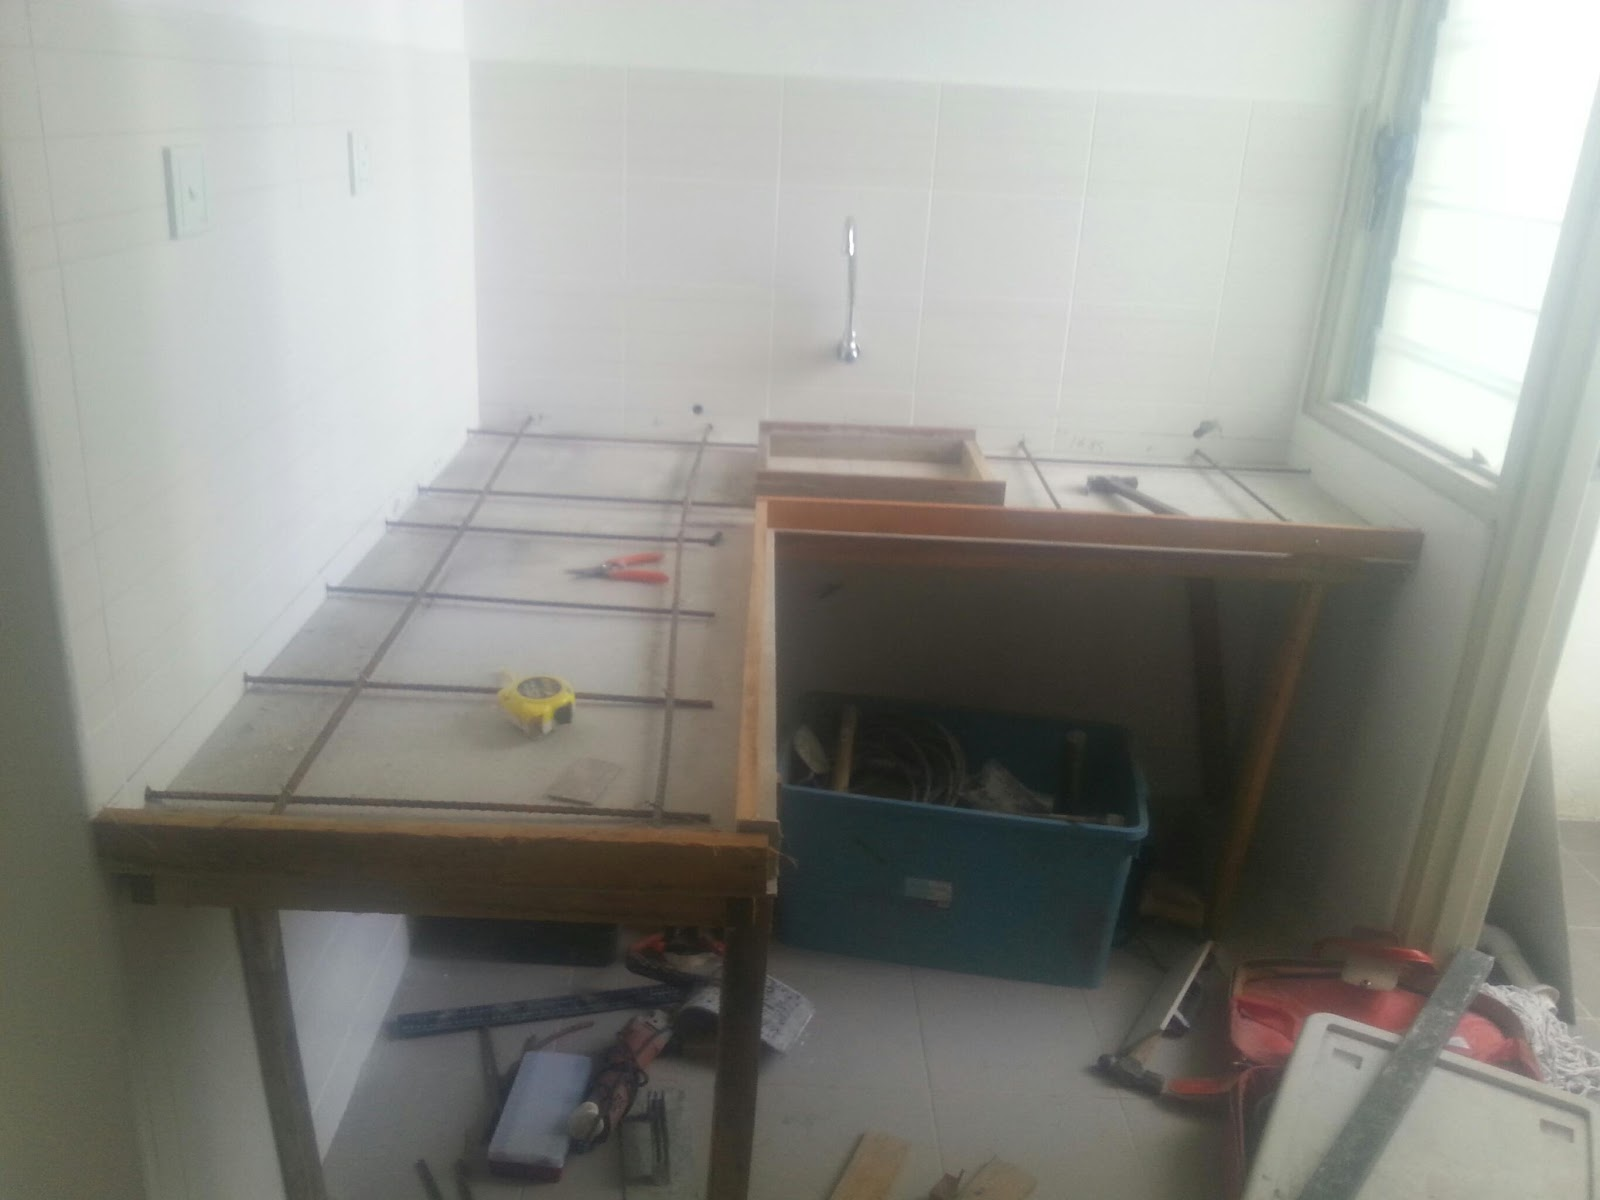 Buat Tabletop Meja Dapur Bandar Baru Bangi Yen 3